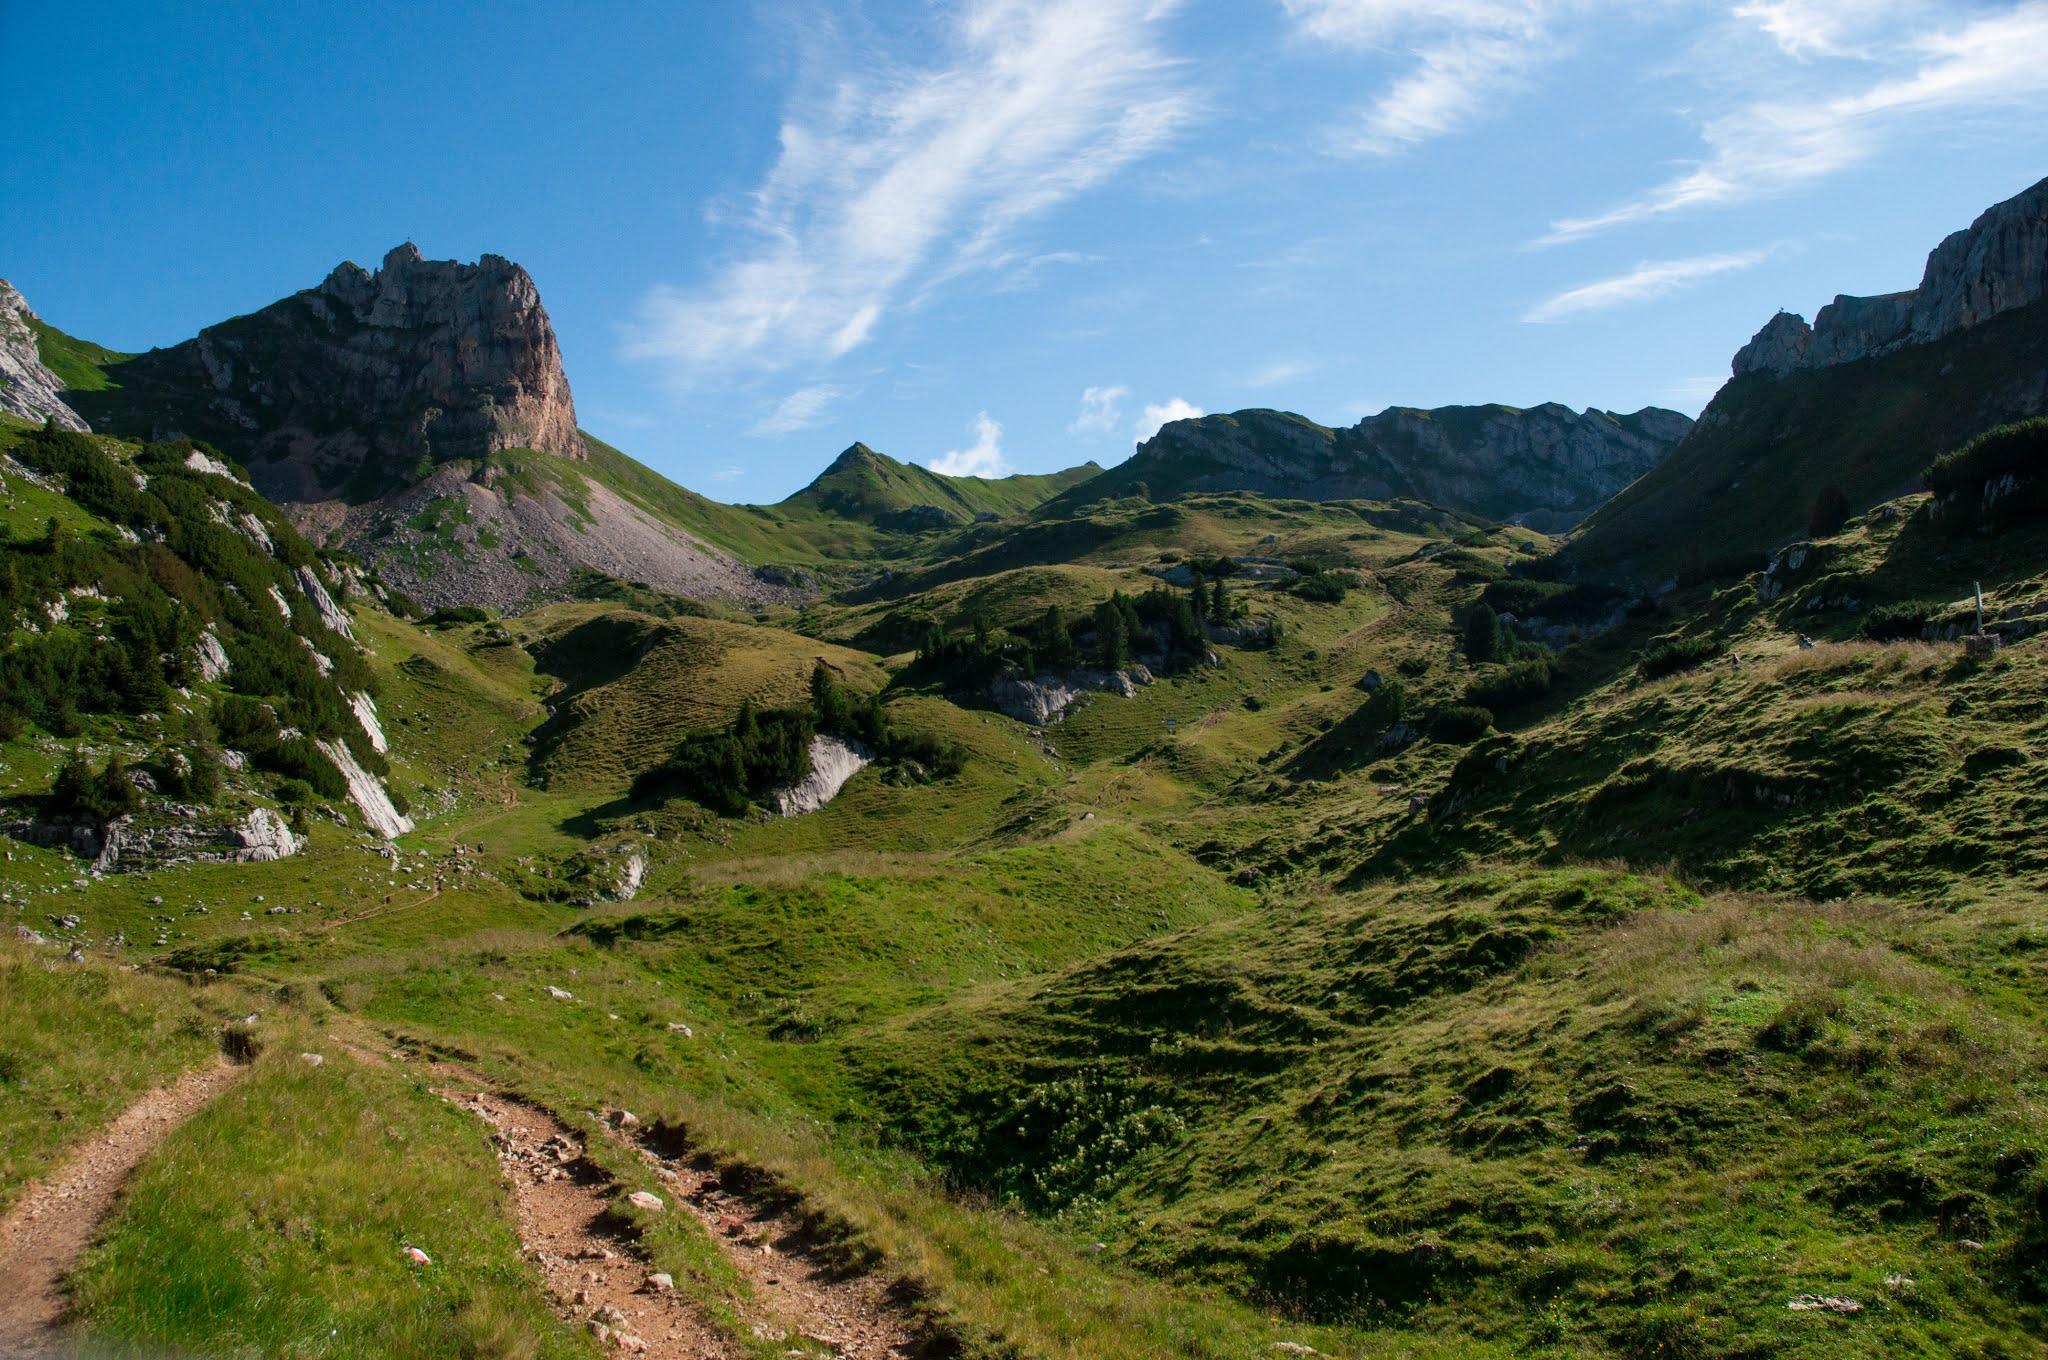 Pohoří Rofan - Tyroly, Rakousko